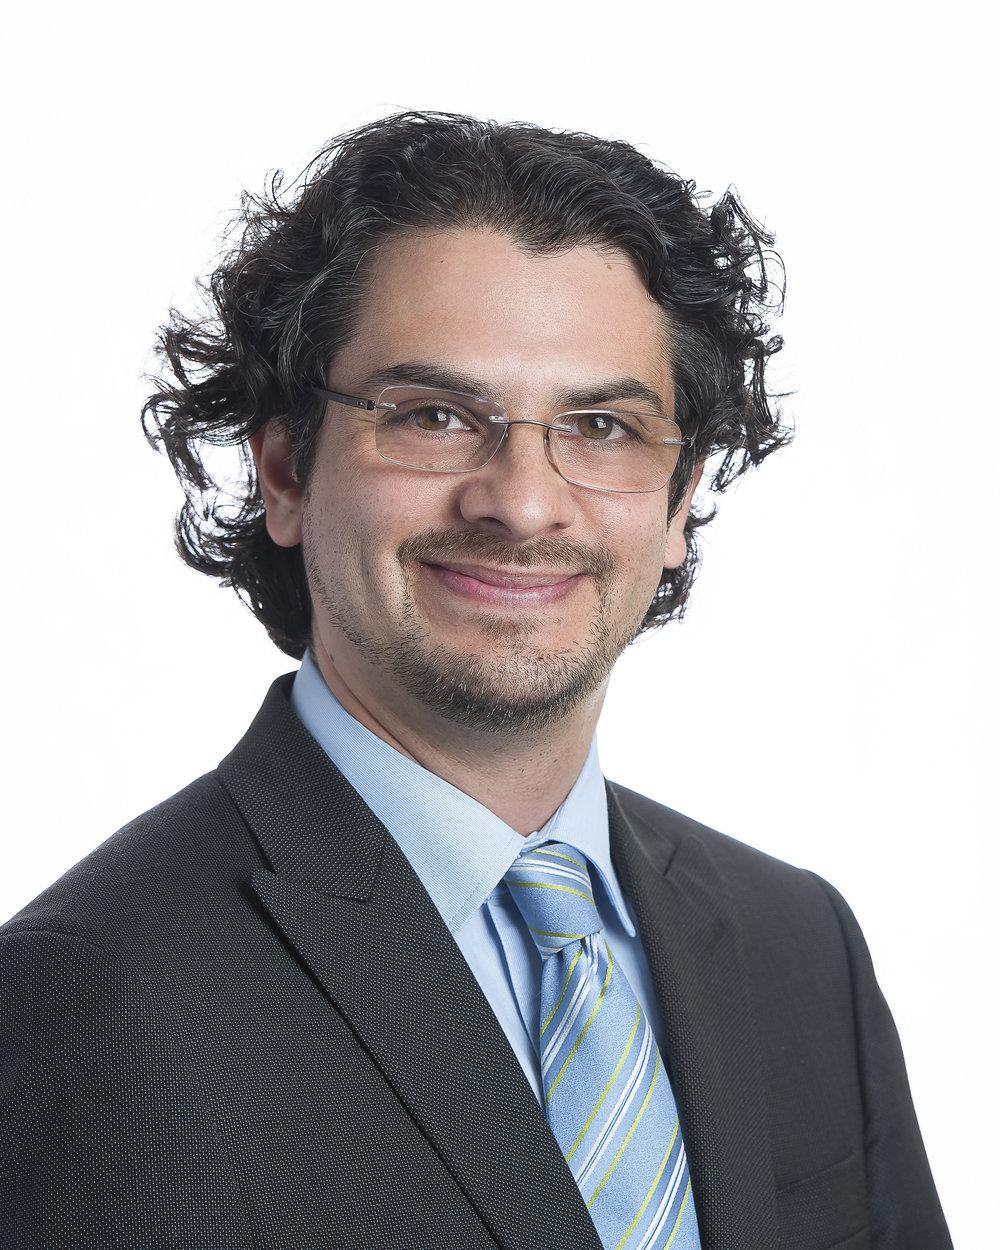 Hugo Muñoz, Professeur titulaire, Faculté de droit de l'Université du Costa Rica et Directeur de l'Instituto de Investigaciones Jurídicas (IIJ)